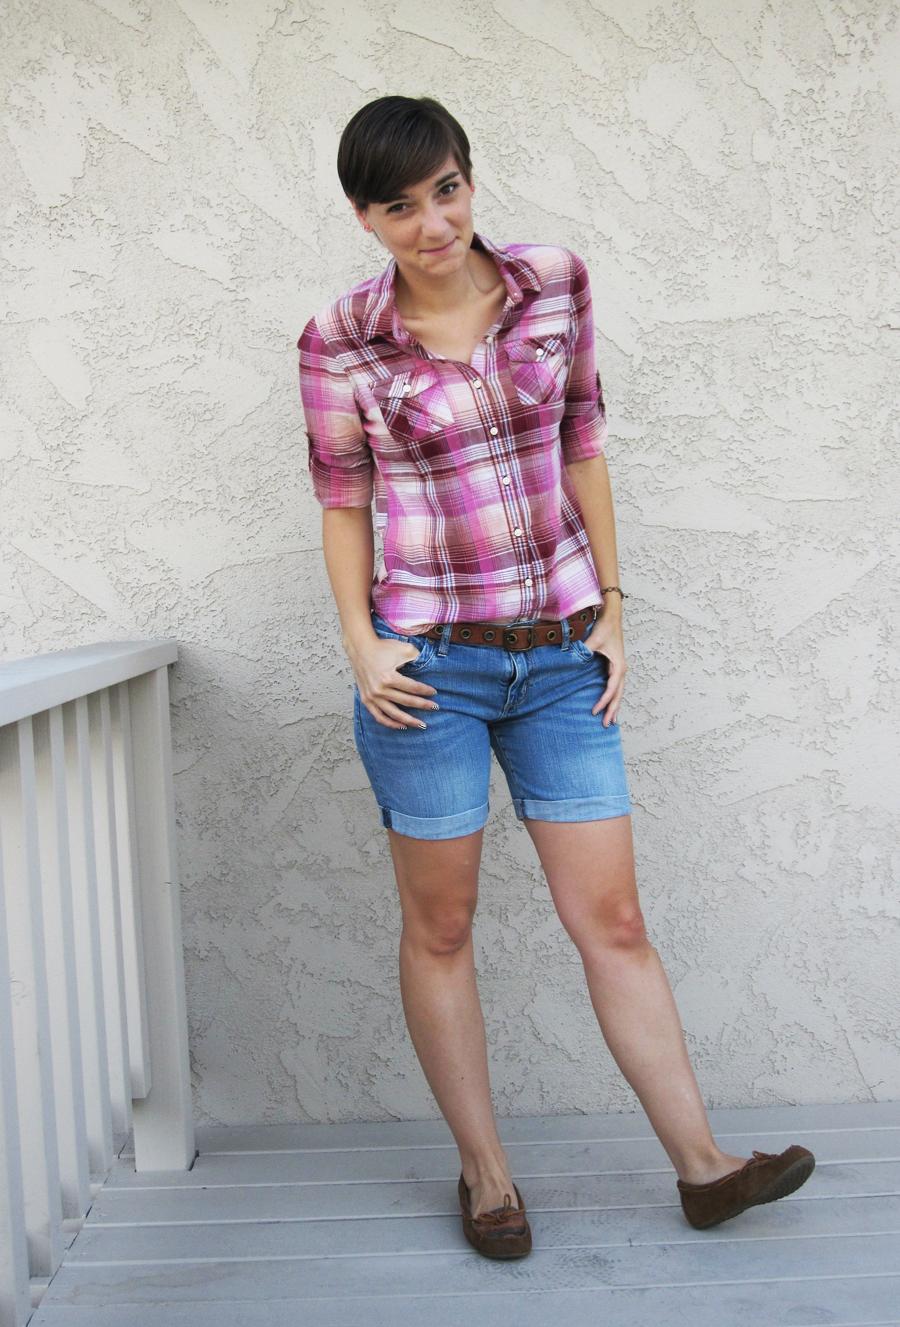 ootd - plaid shirt, shorts, belt, moccasins